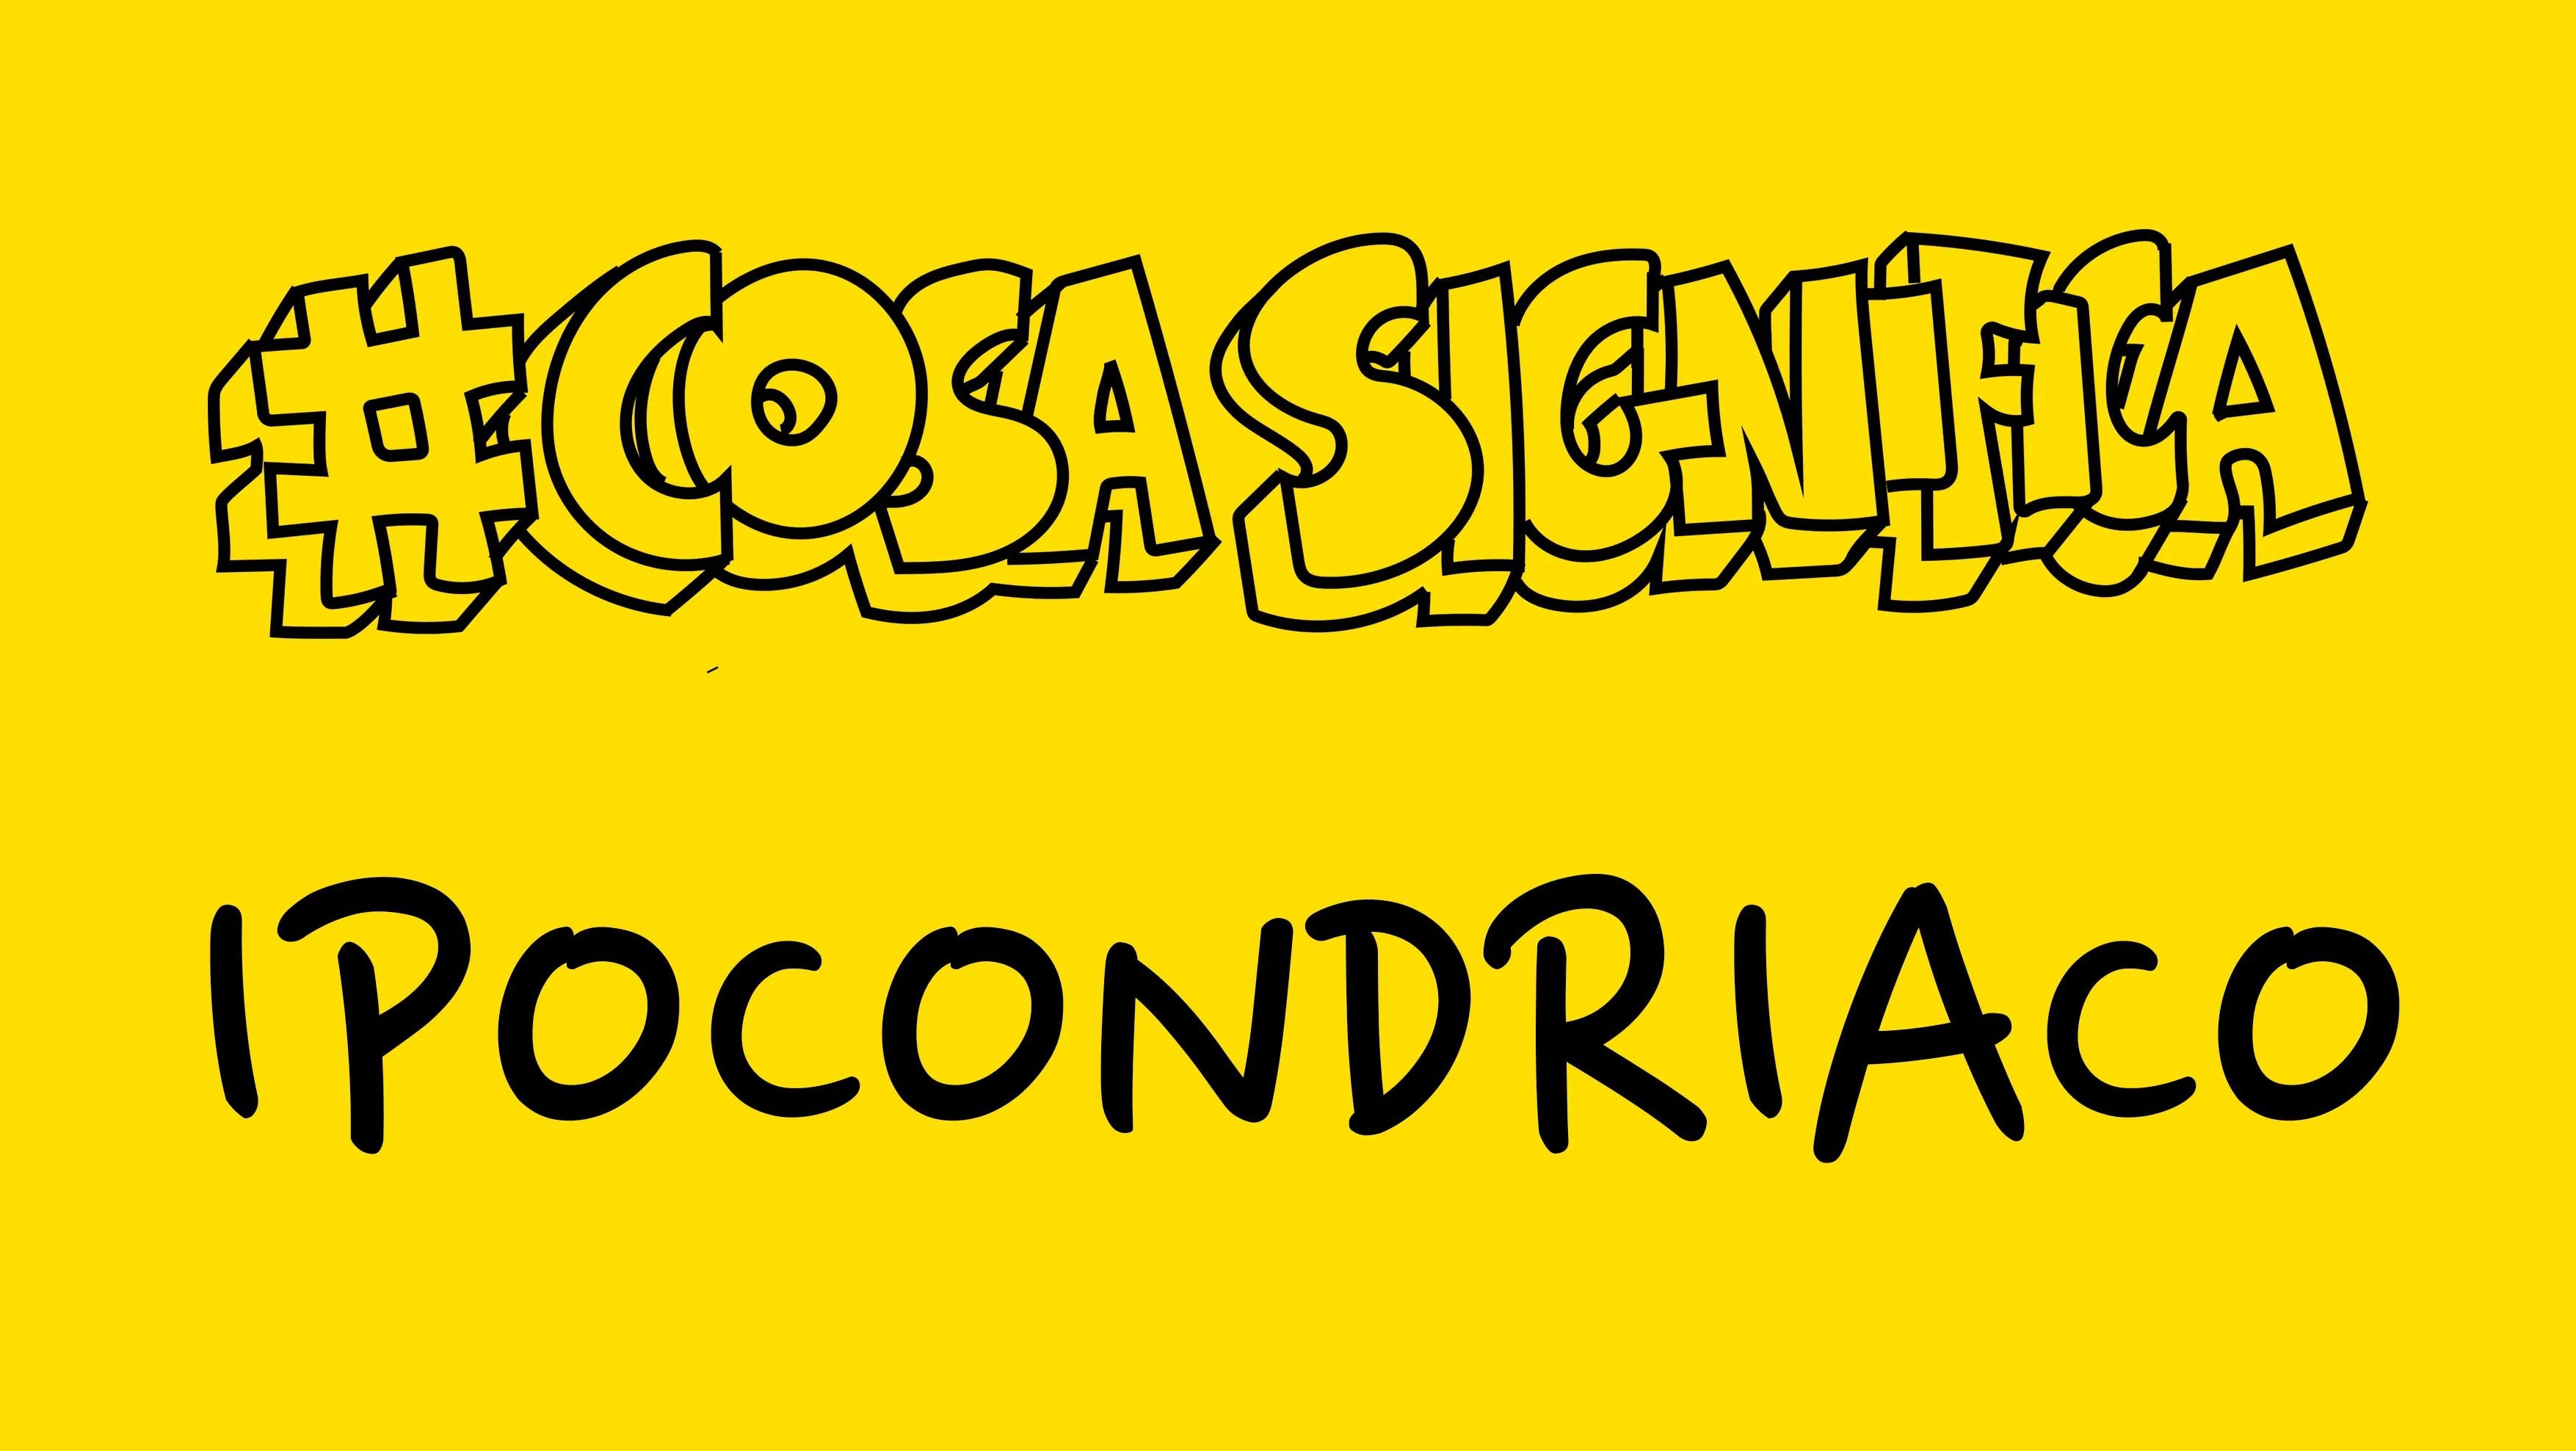 #COSASIGNIFICA IPOCONDRIACO? #TELOSPIEGO!